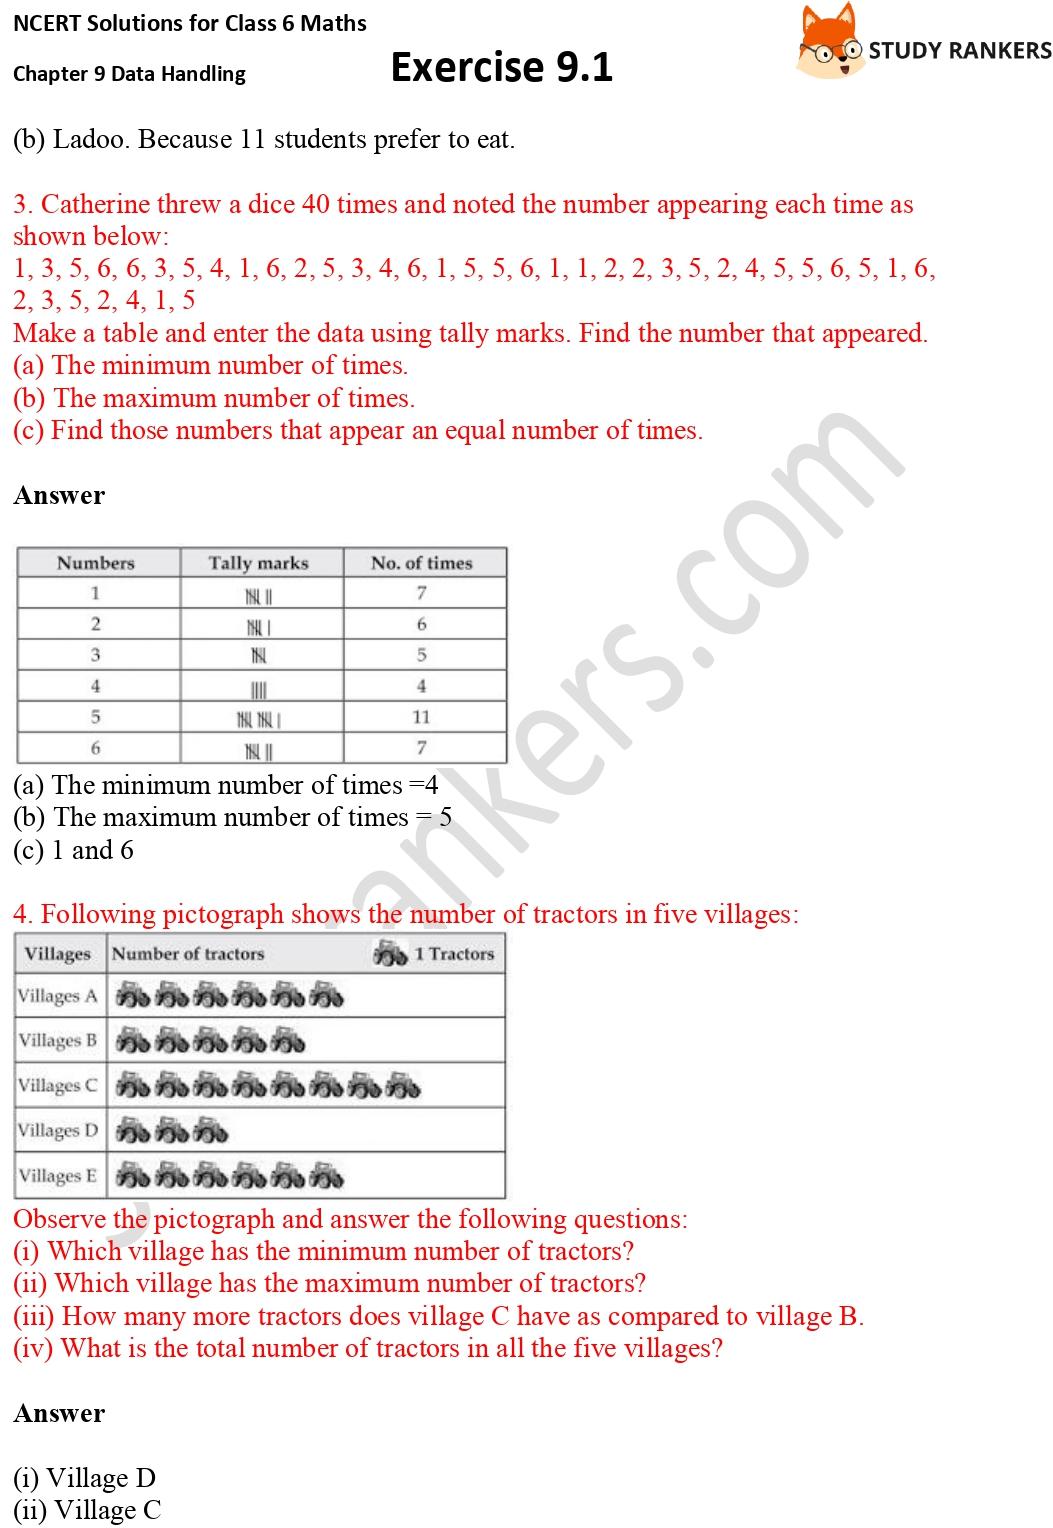 NCERT Solutions for Class 6 Maths Chapter 9 Data Handling Exercise 9.1 Part 2